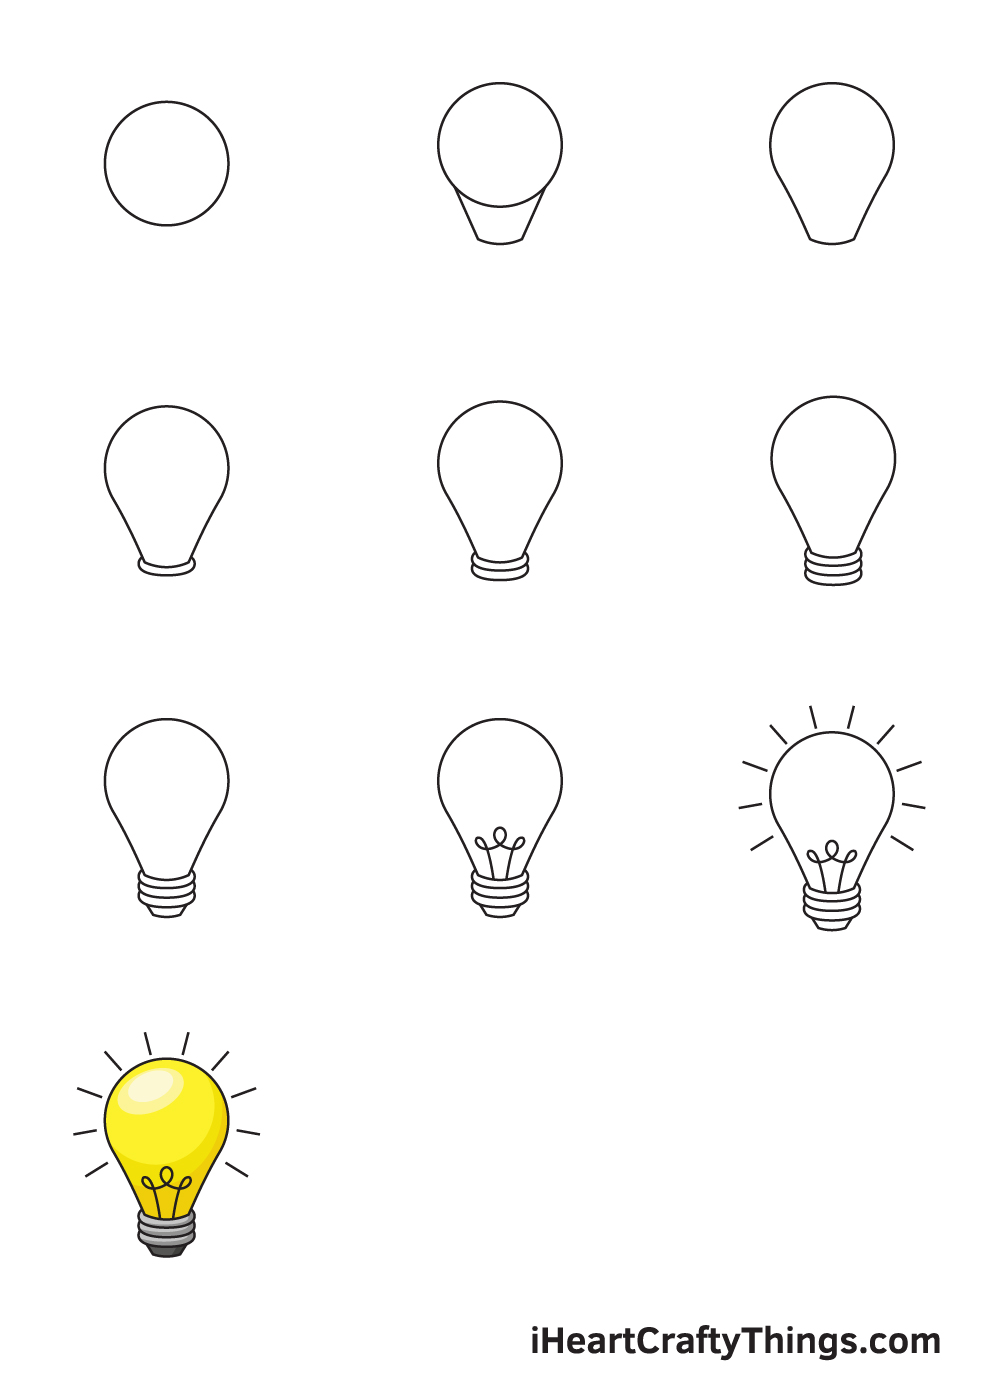 drawing light bulb in 9 steps